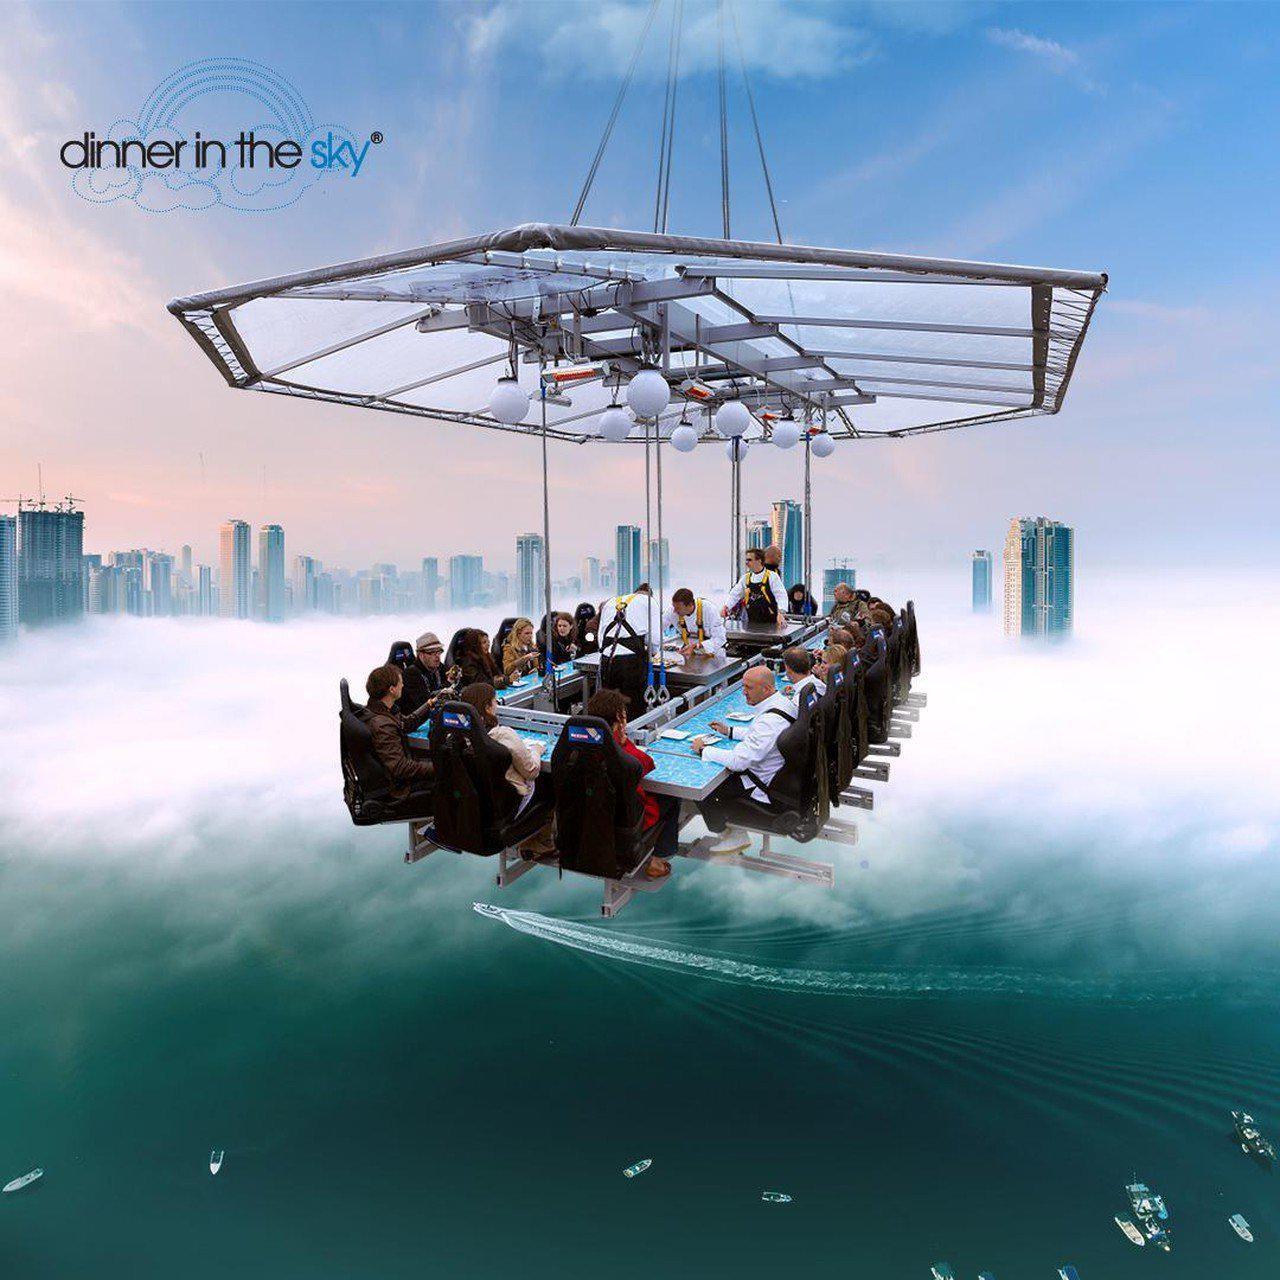 Bremen corporate event venues Unusual Dinner in the sky image 0